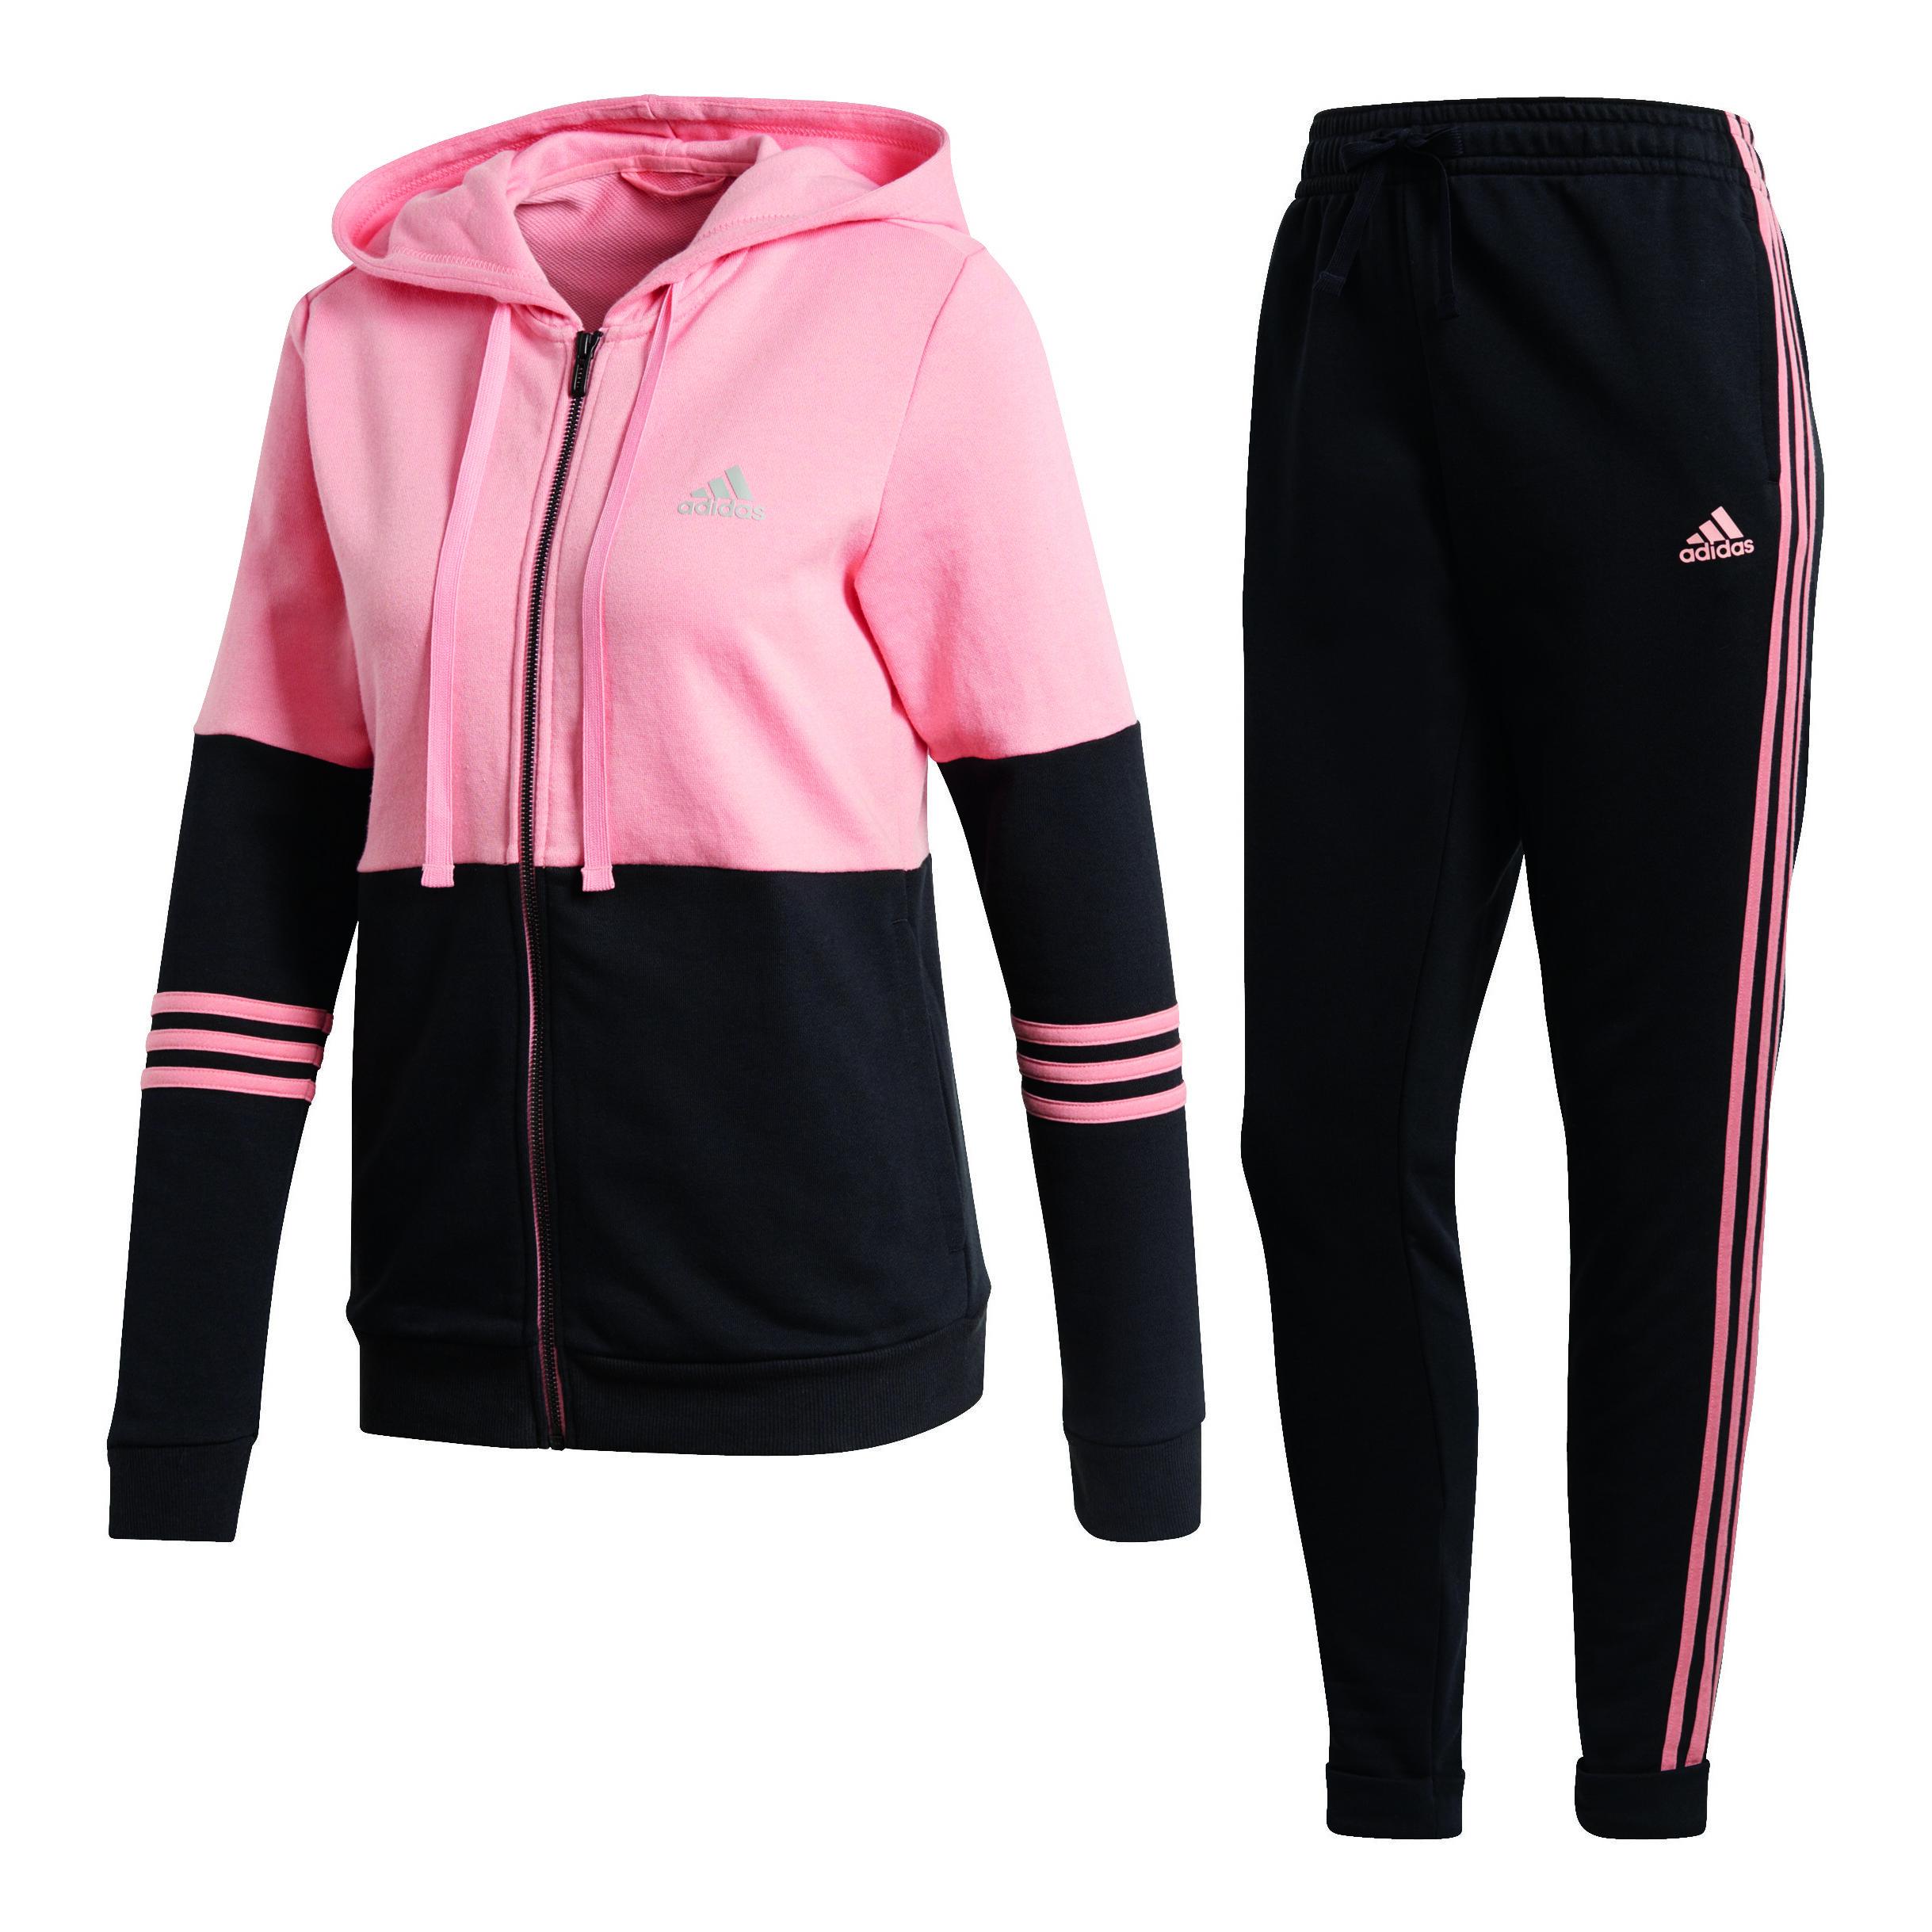 adidas Co Energize Trainingsanzug Damen - Rosa, Schwarz online ...